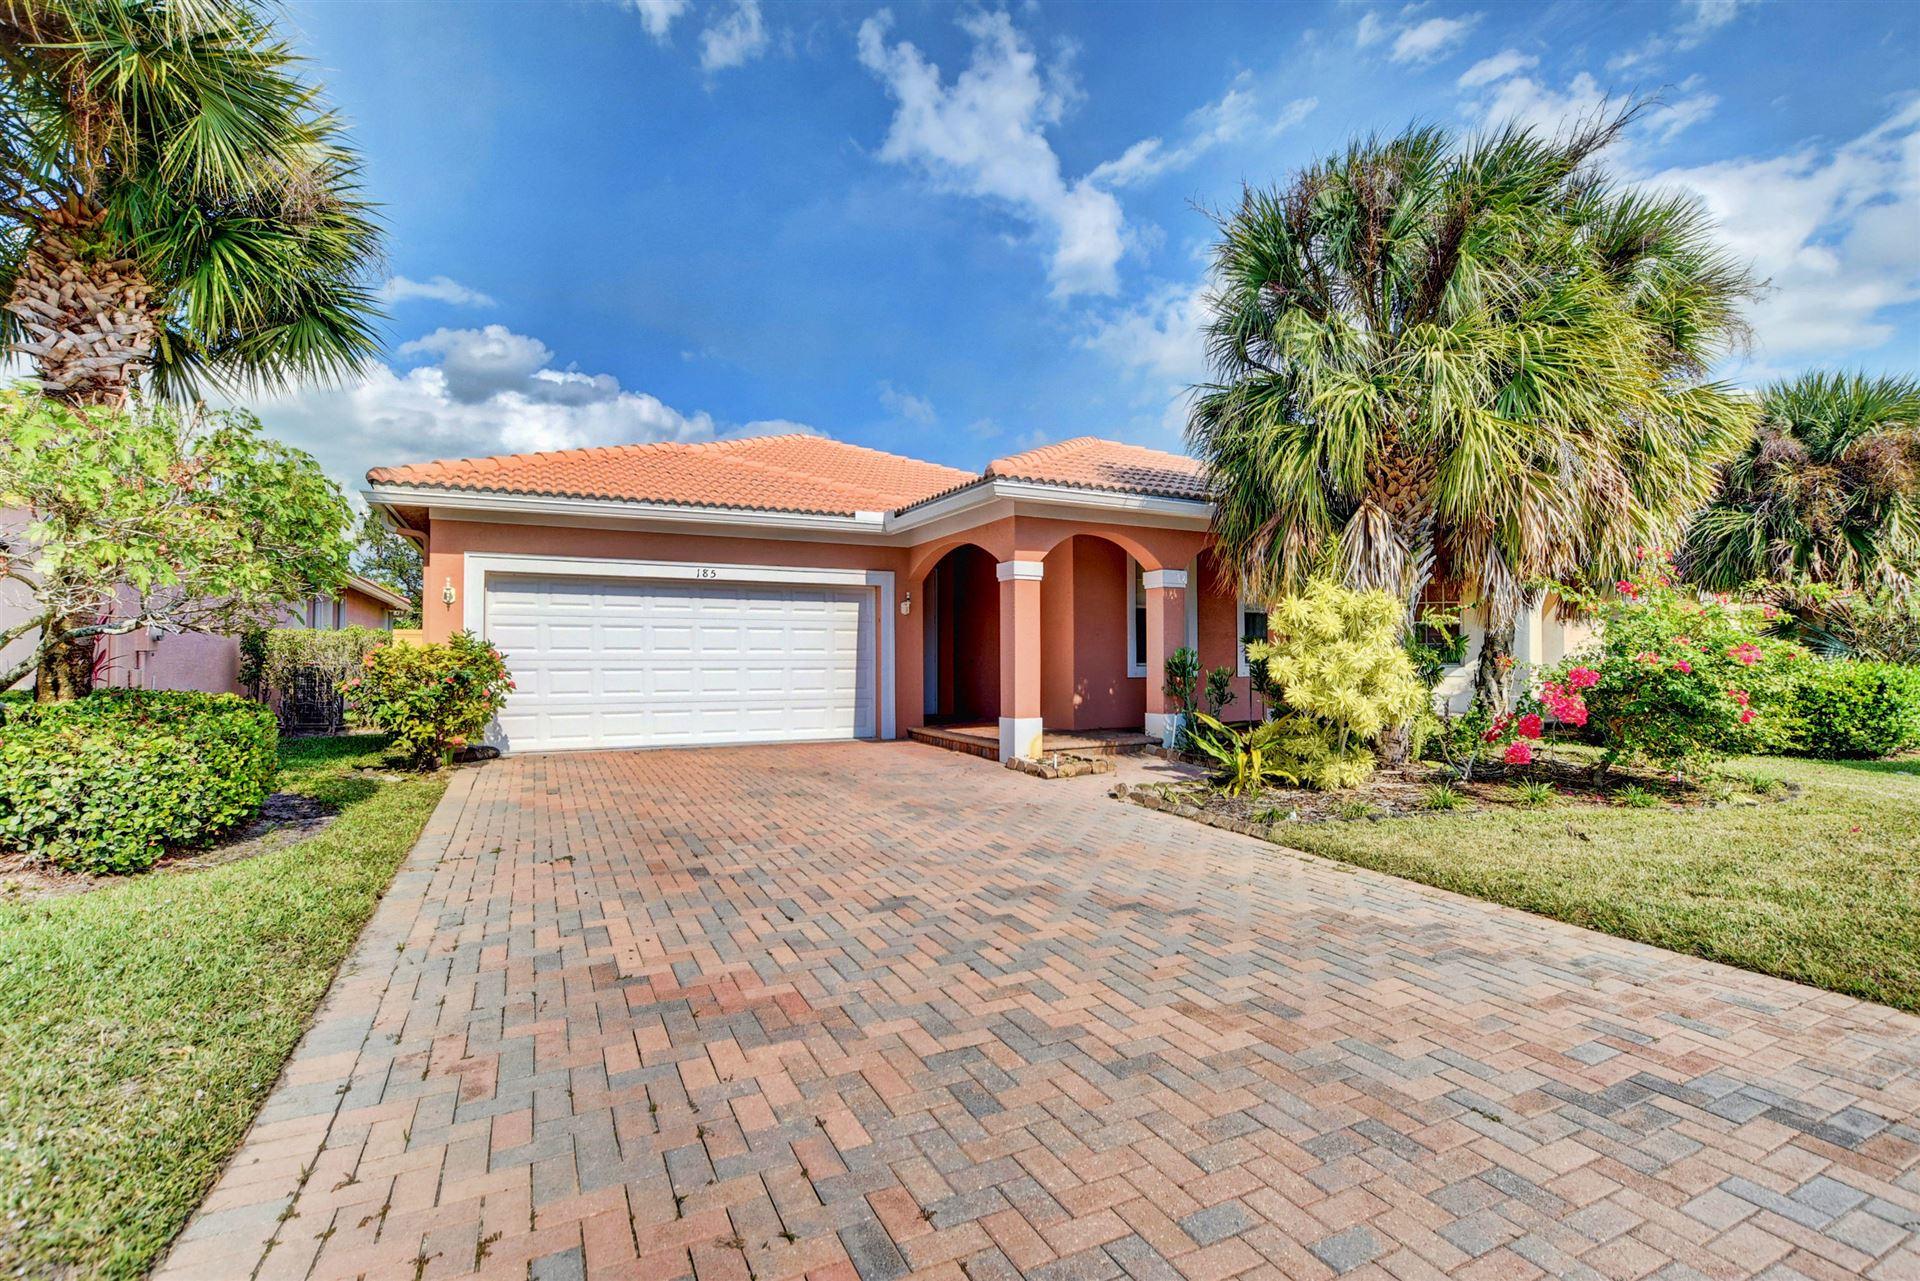 185 Catania Way, Royal Palm Beach, FL 33411 - #: RX-10739885